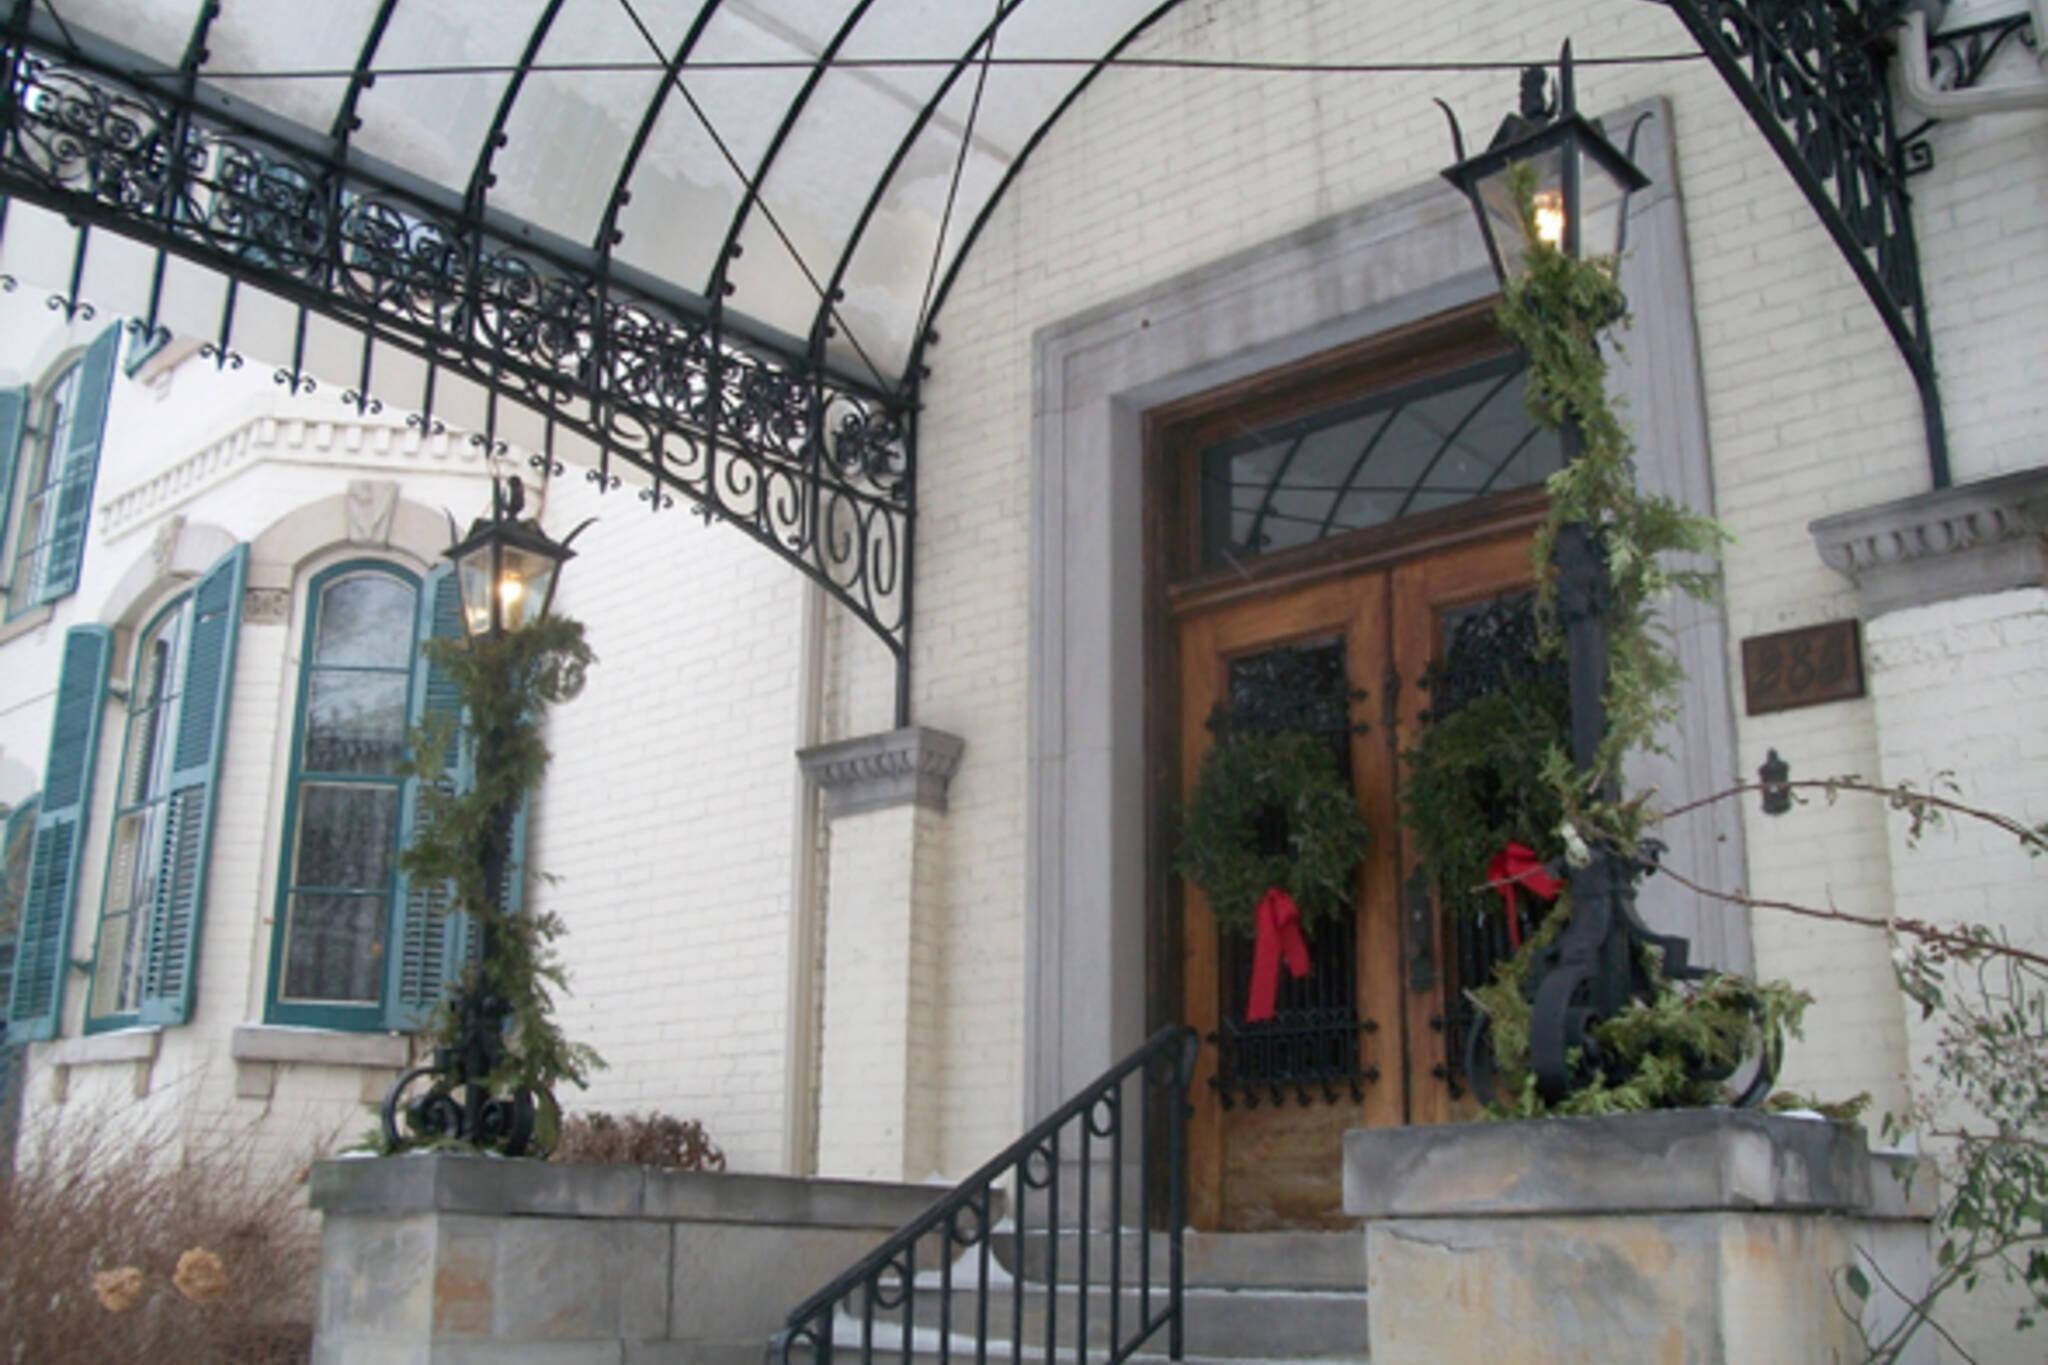 Toronto, 1920s, Christmas, the Austins, Spadina Museum: Historic House and Gardens